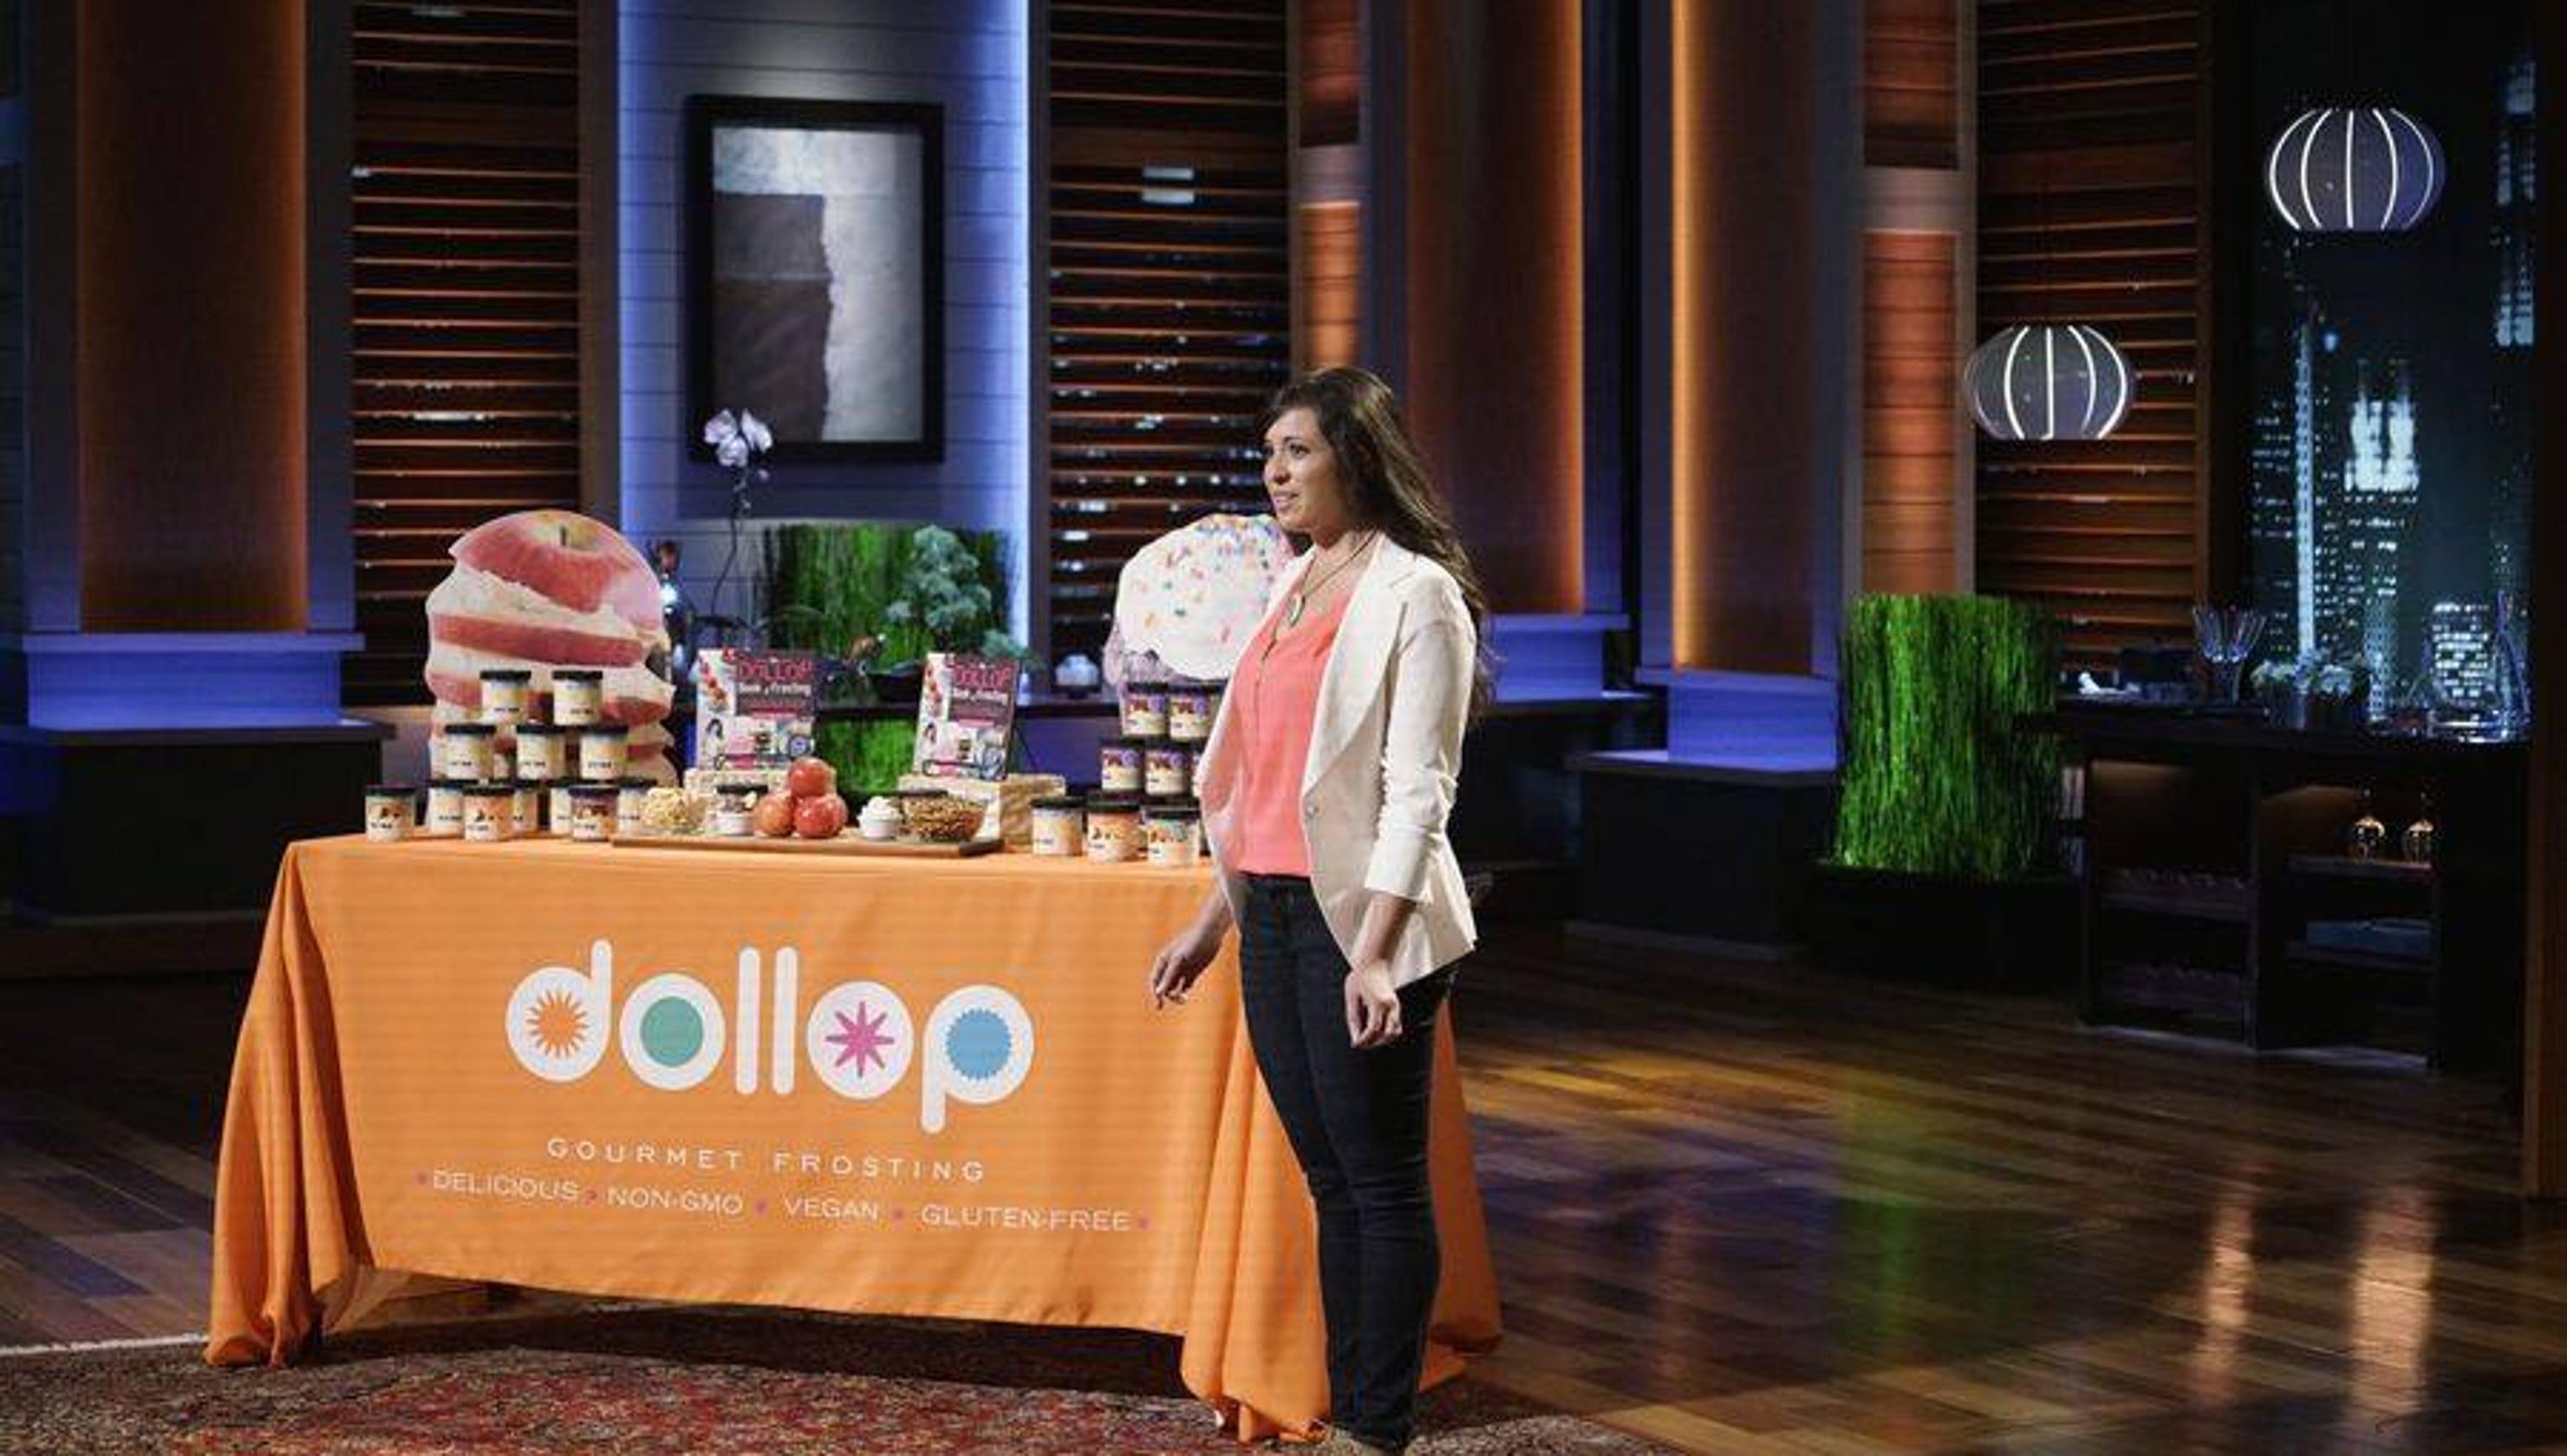 Frosting creator Heather Saffer puts Dollop brand up for sale